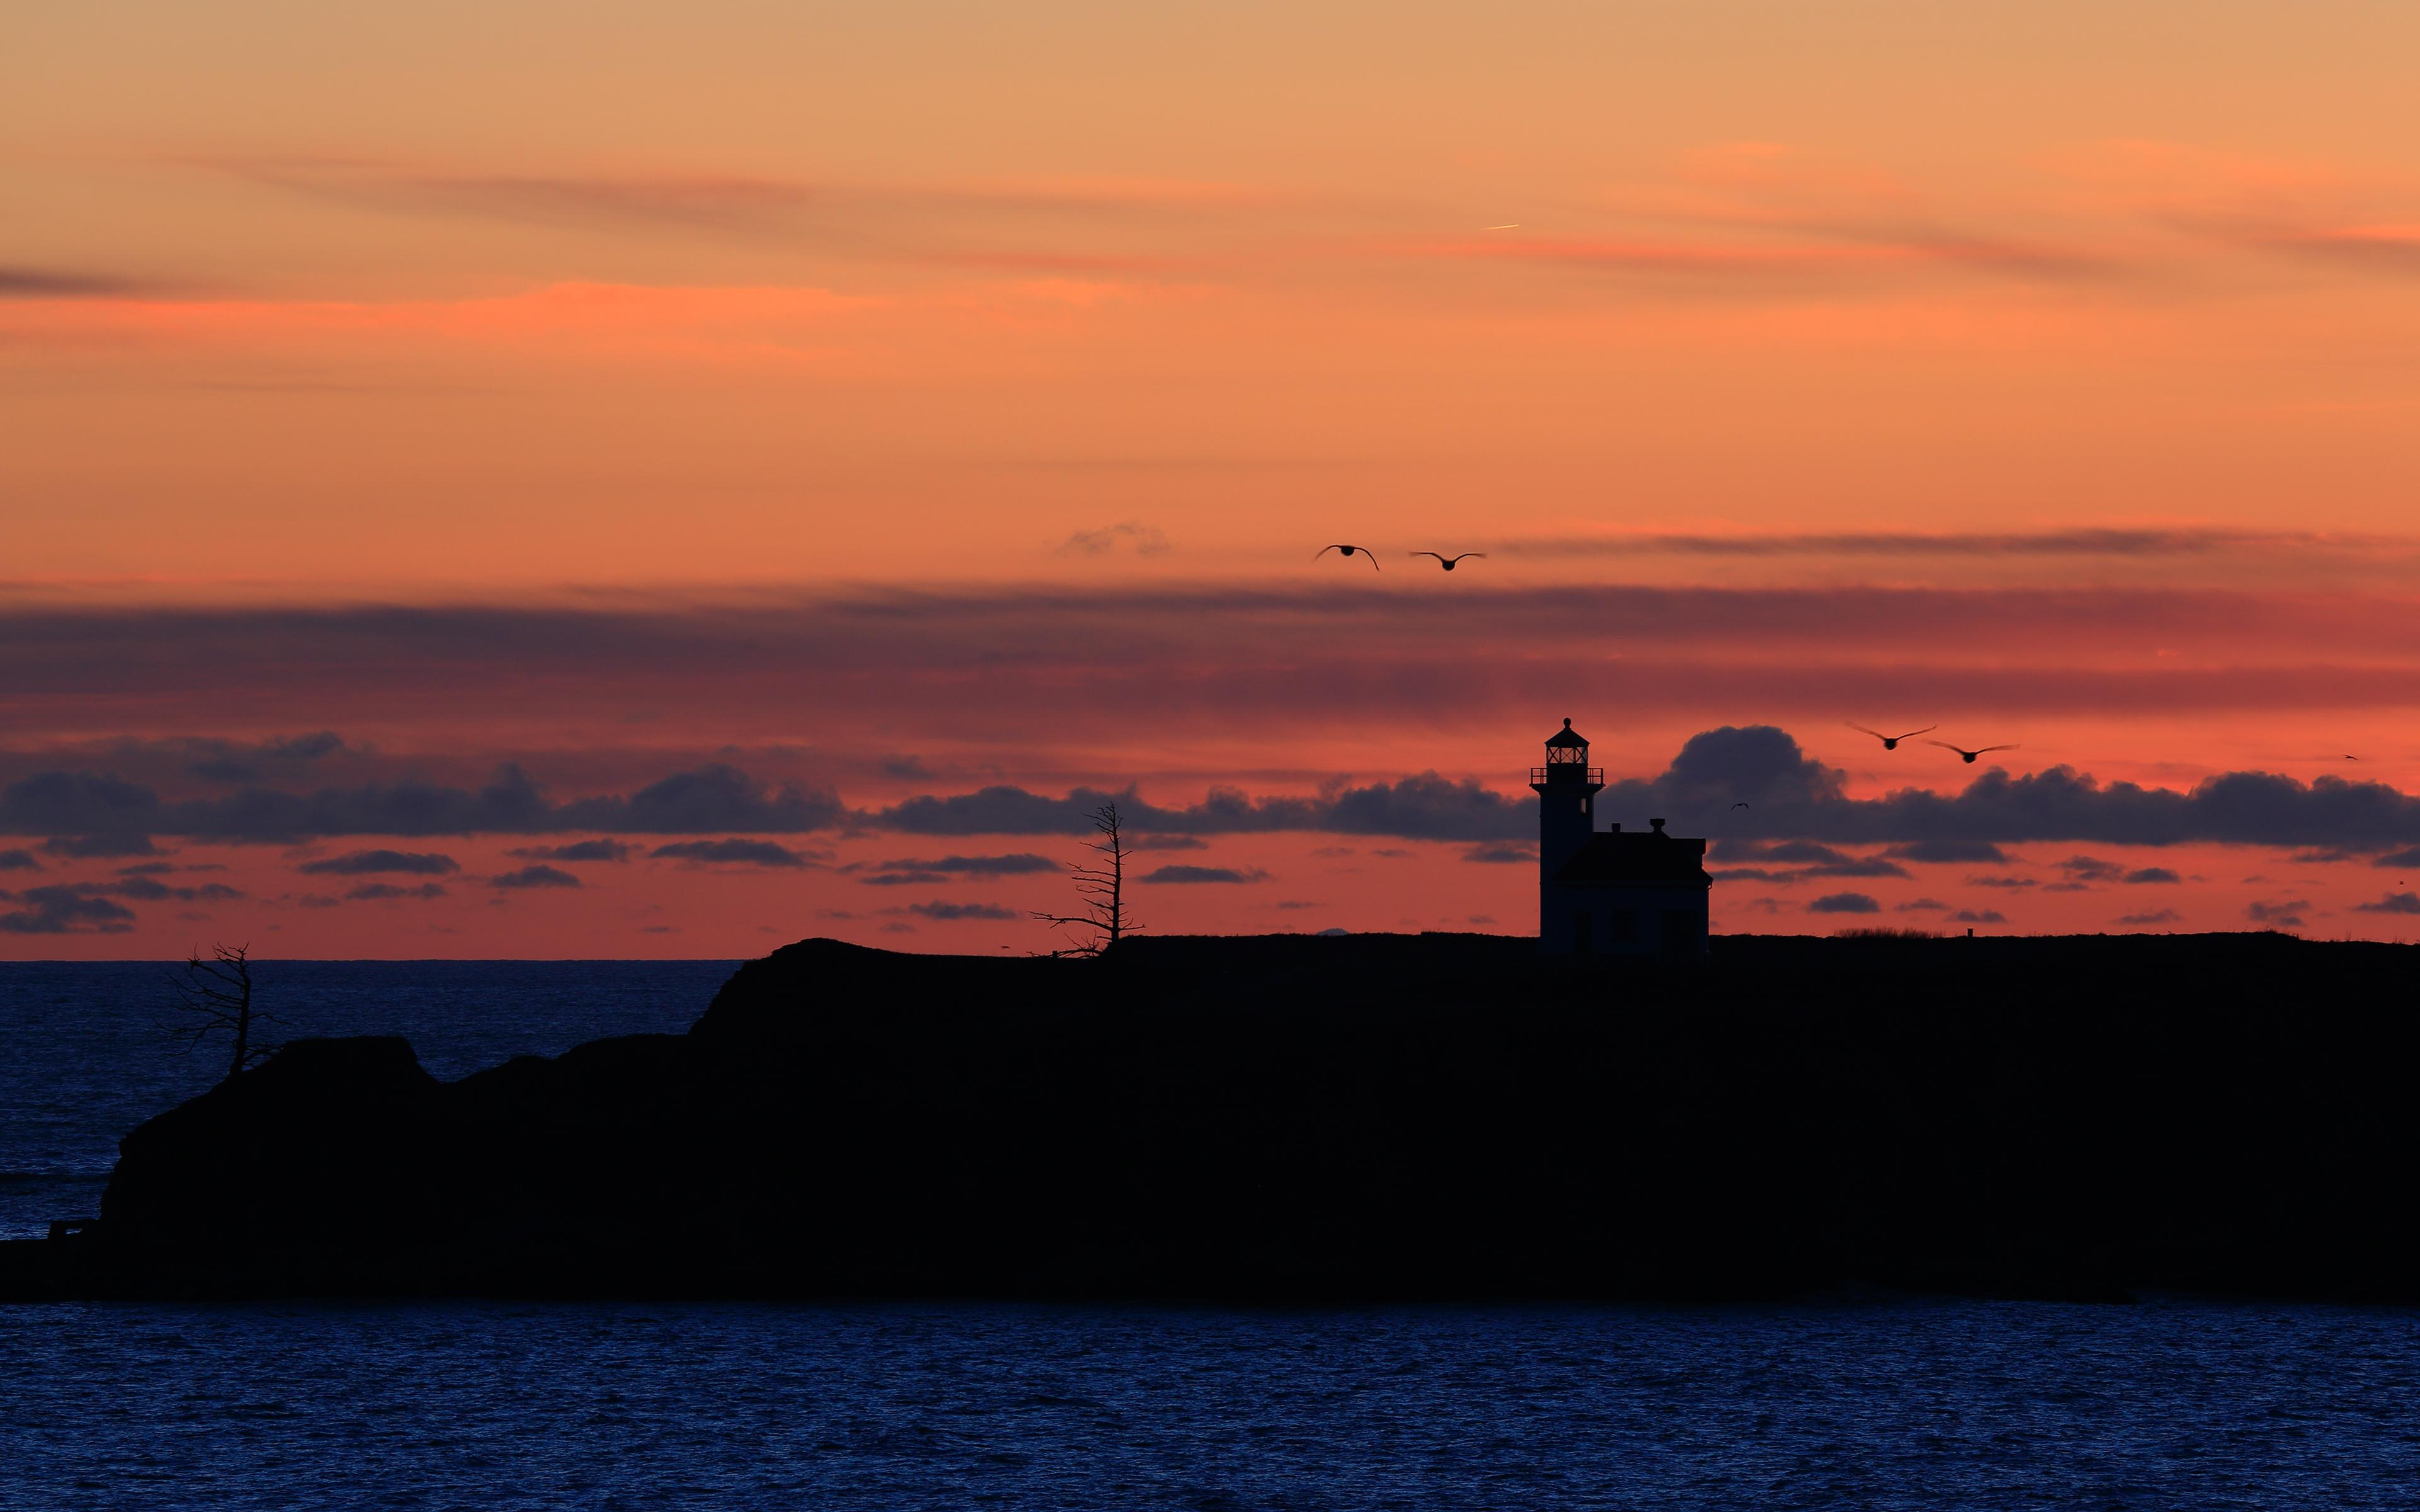 lighthouse at night - HD1920×1080